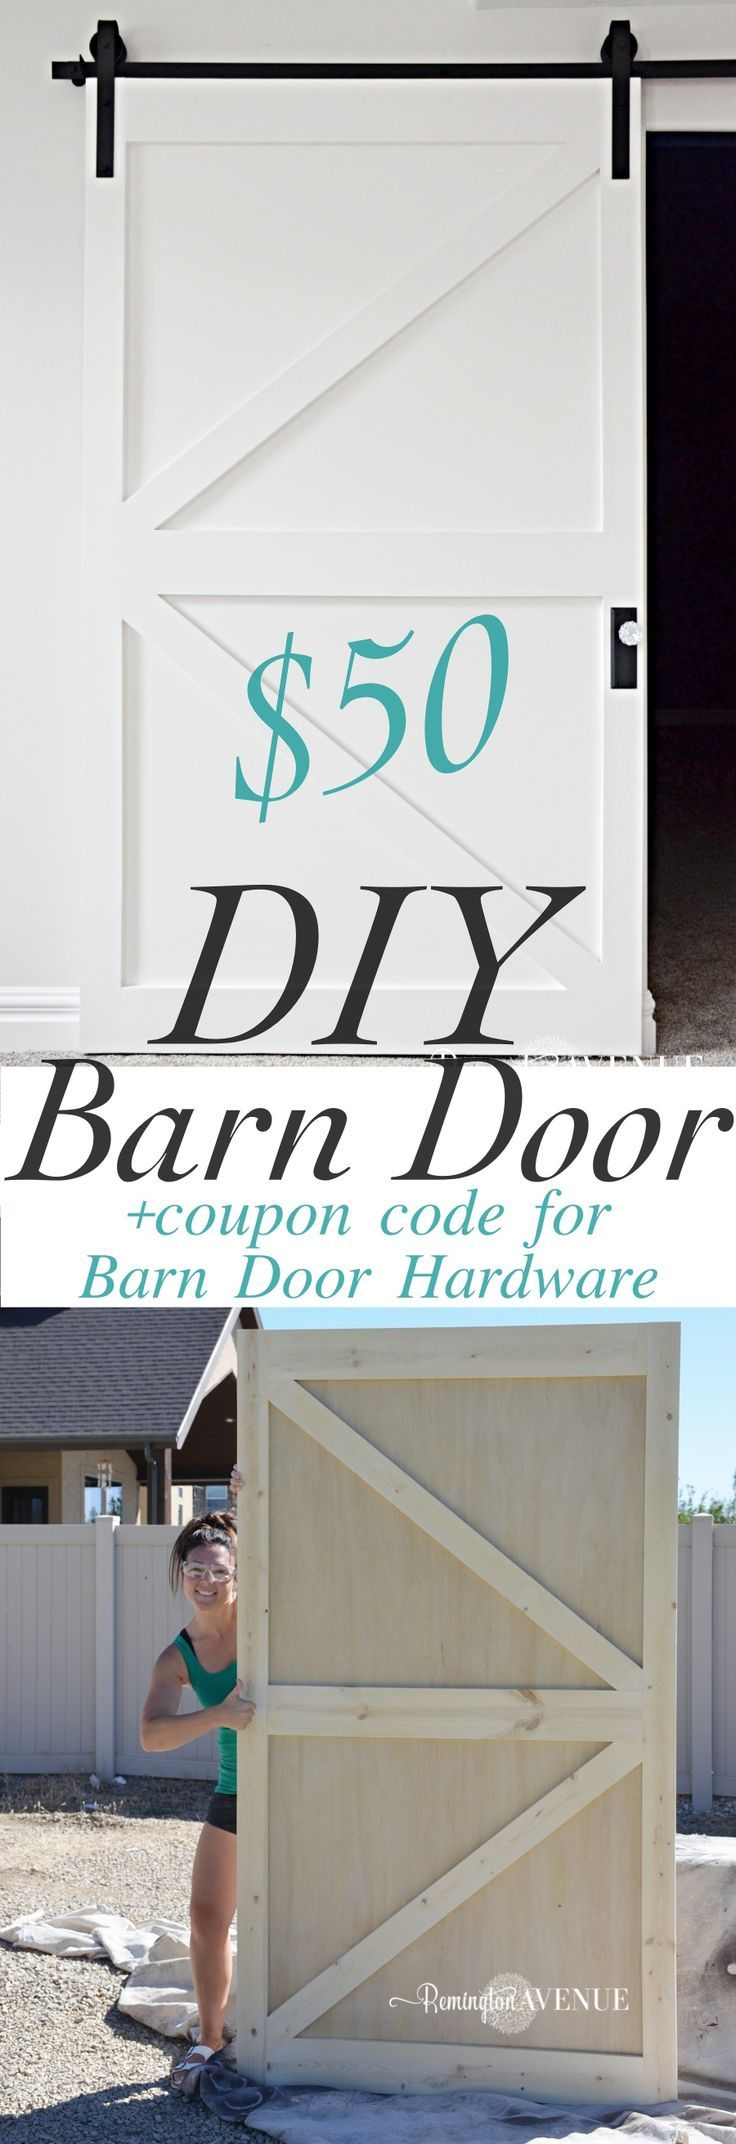 $50 DIY British Brace Barn Door -with promo code for The Barn Door Hardware Store  Remington Avenue (scheduled via http://www.tailwindapp.com?utm_source=pinterest&utm_medium=twpin&utm_content=post151595903&utm_campaign=scheduler_attribution)